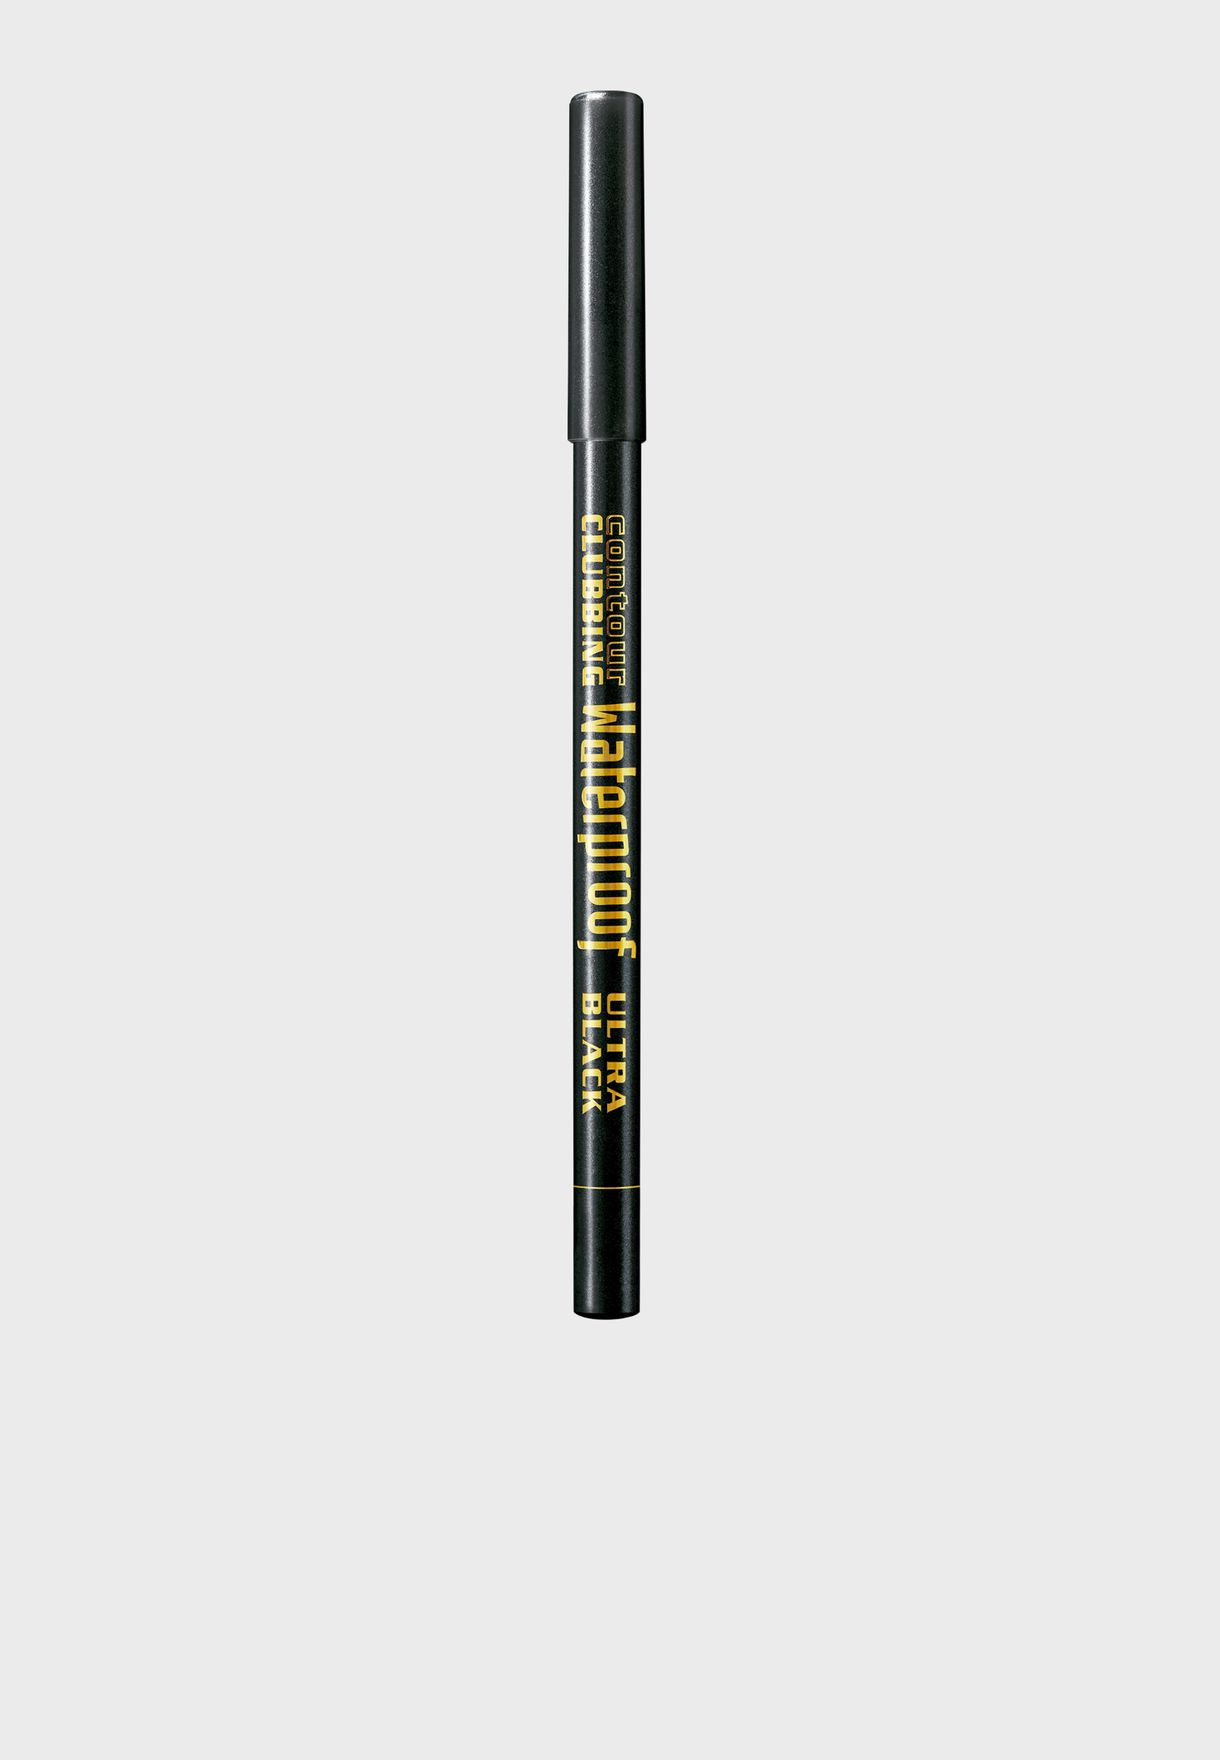 Contour Clubbing Waterproof Eyeliner Ultra Black